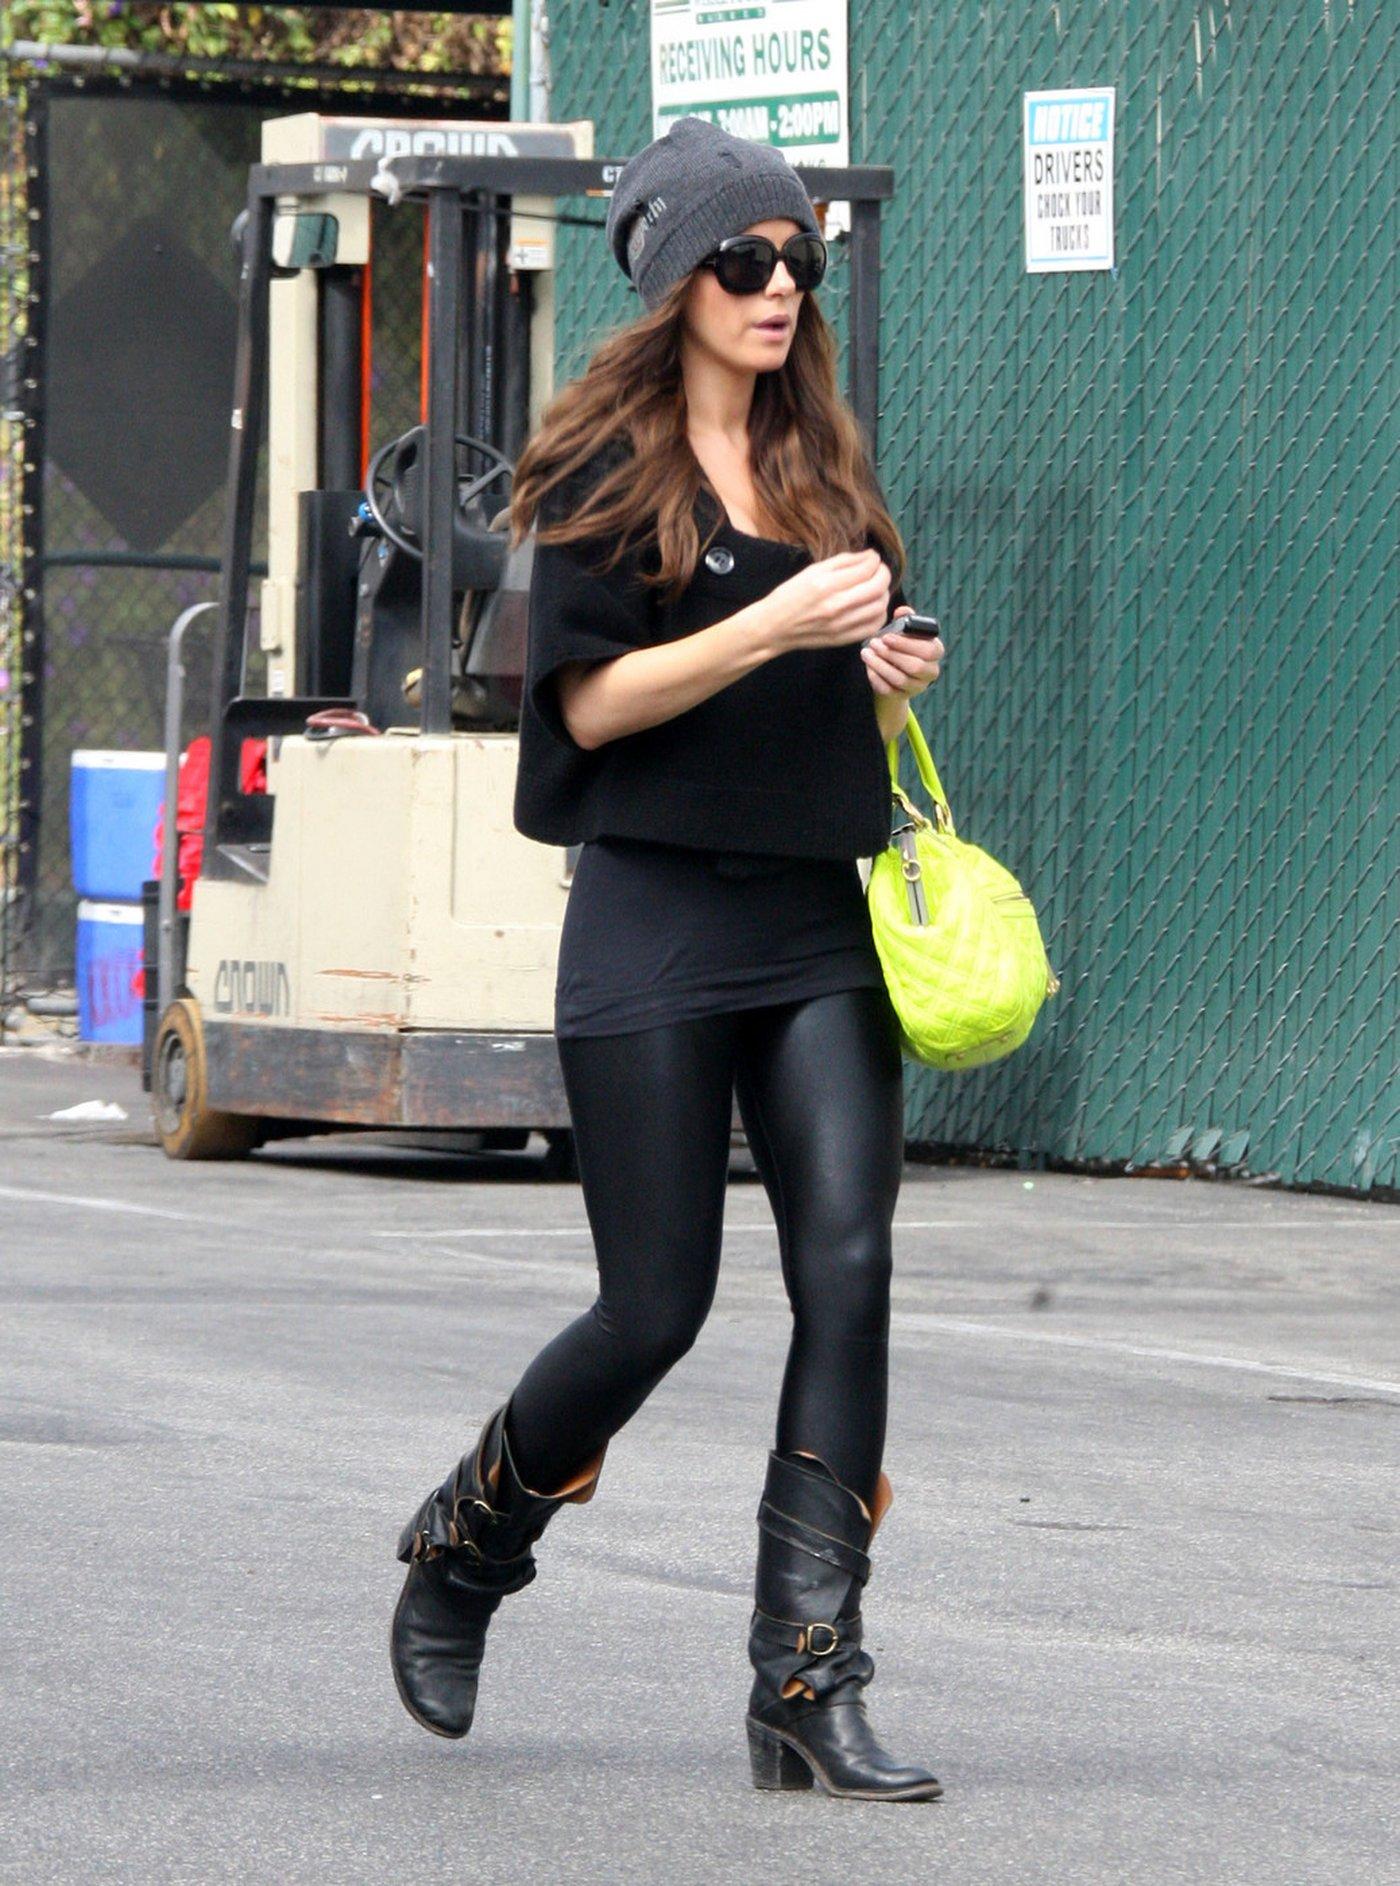 Shiny leggings candid Kate Beckinsale – Leggings Candids – Oct 2010